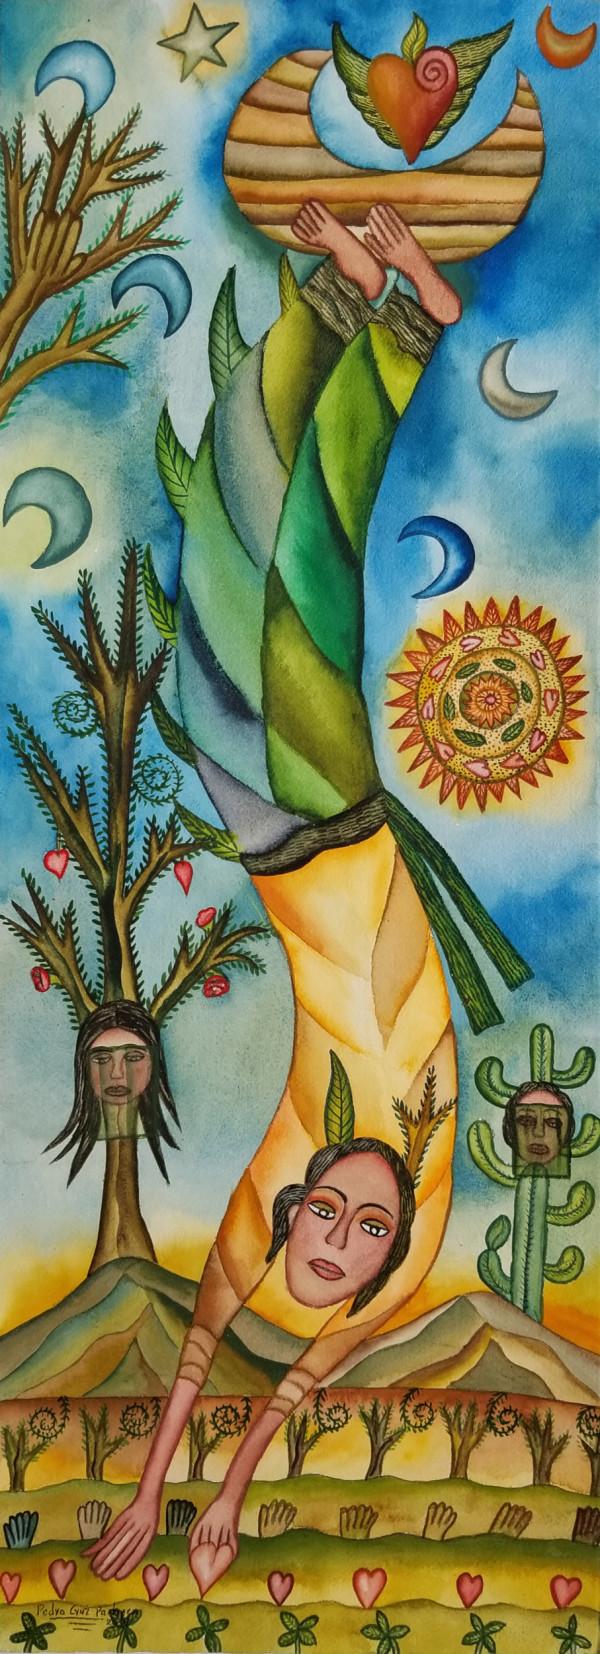 Coshechando Amor / Harvesting Love by Pedro Cruz Pacheco